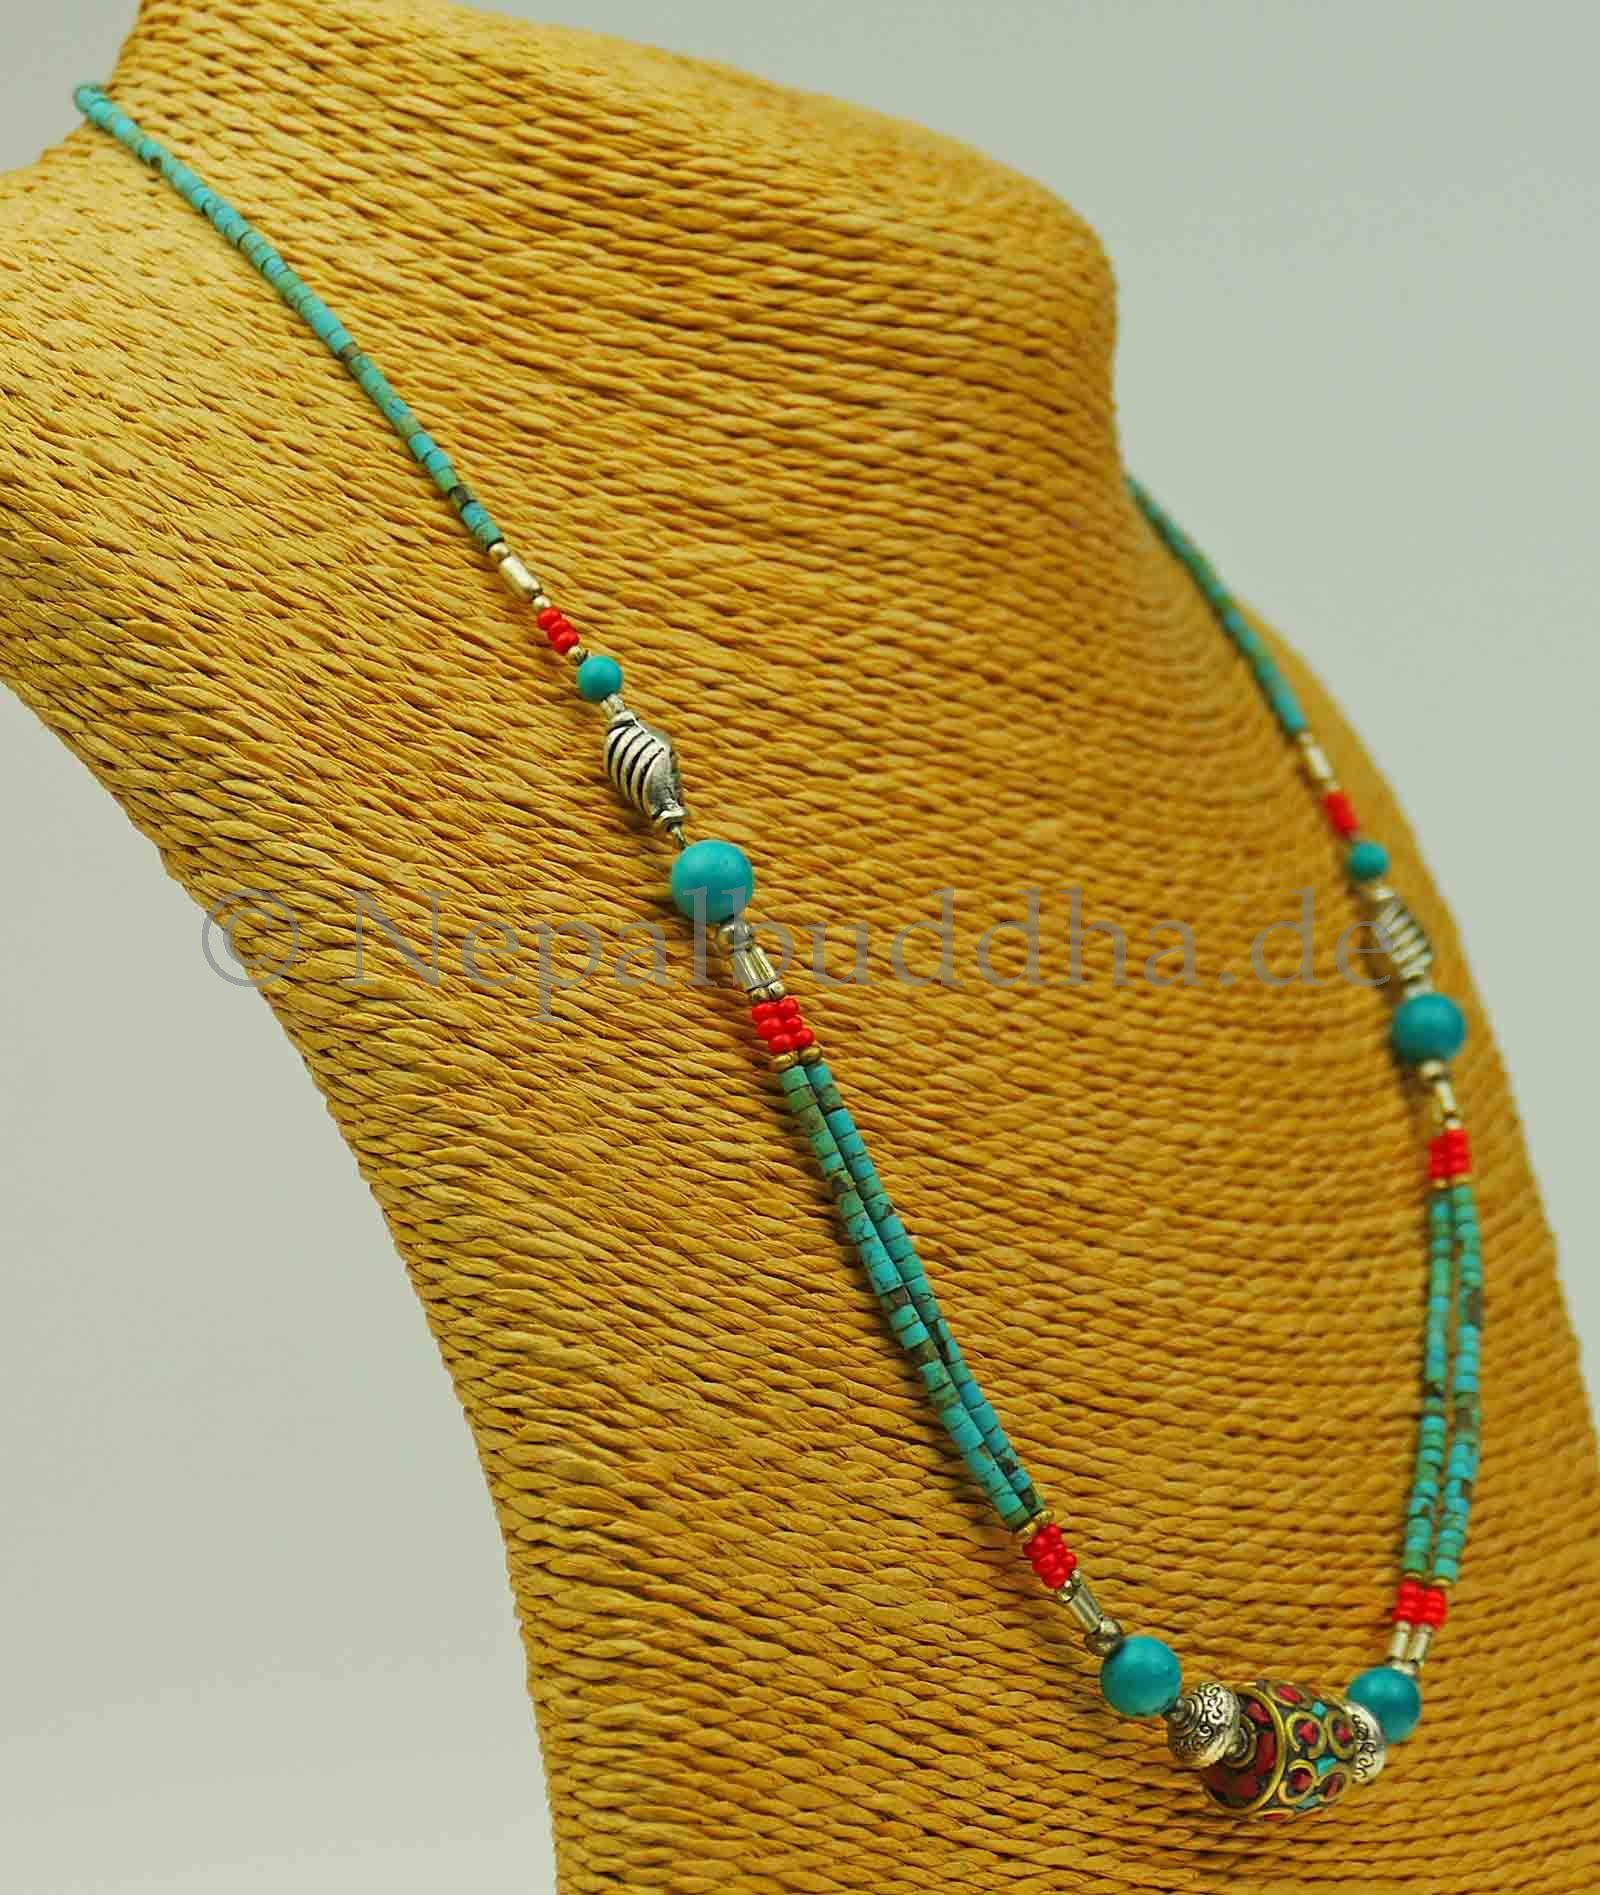 Halskette  Modeschmuck Türkis Halsschmuck Nepal Kette Nepalbuddha Indien a62//1